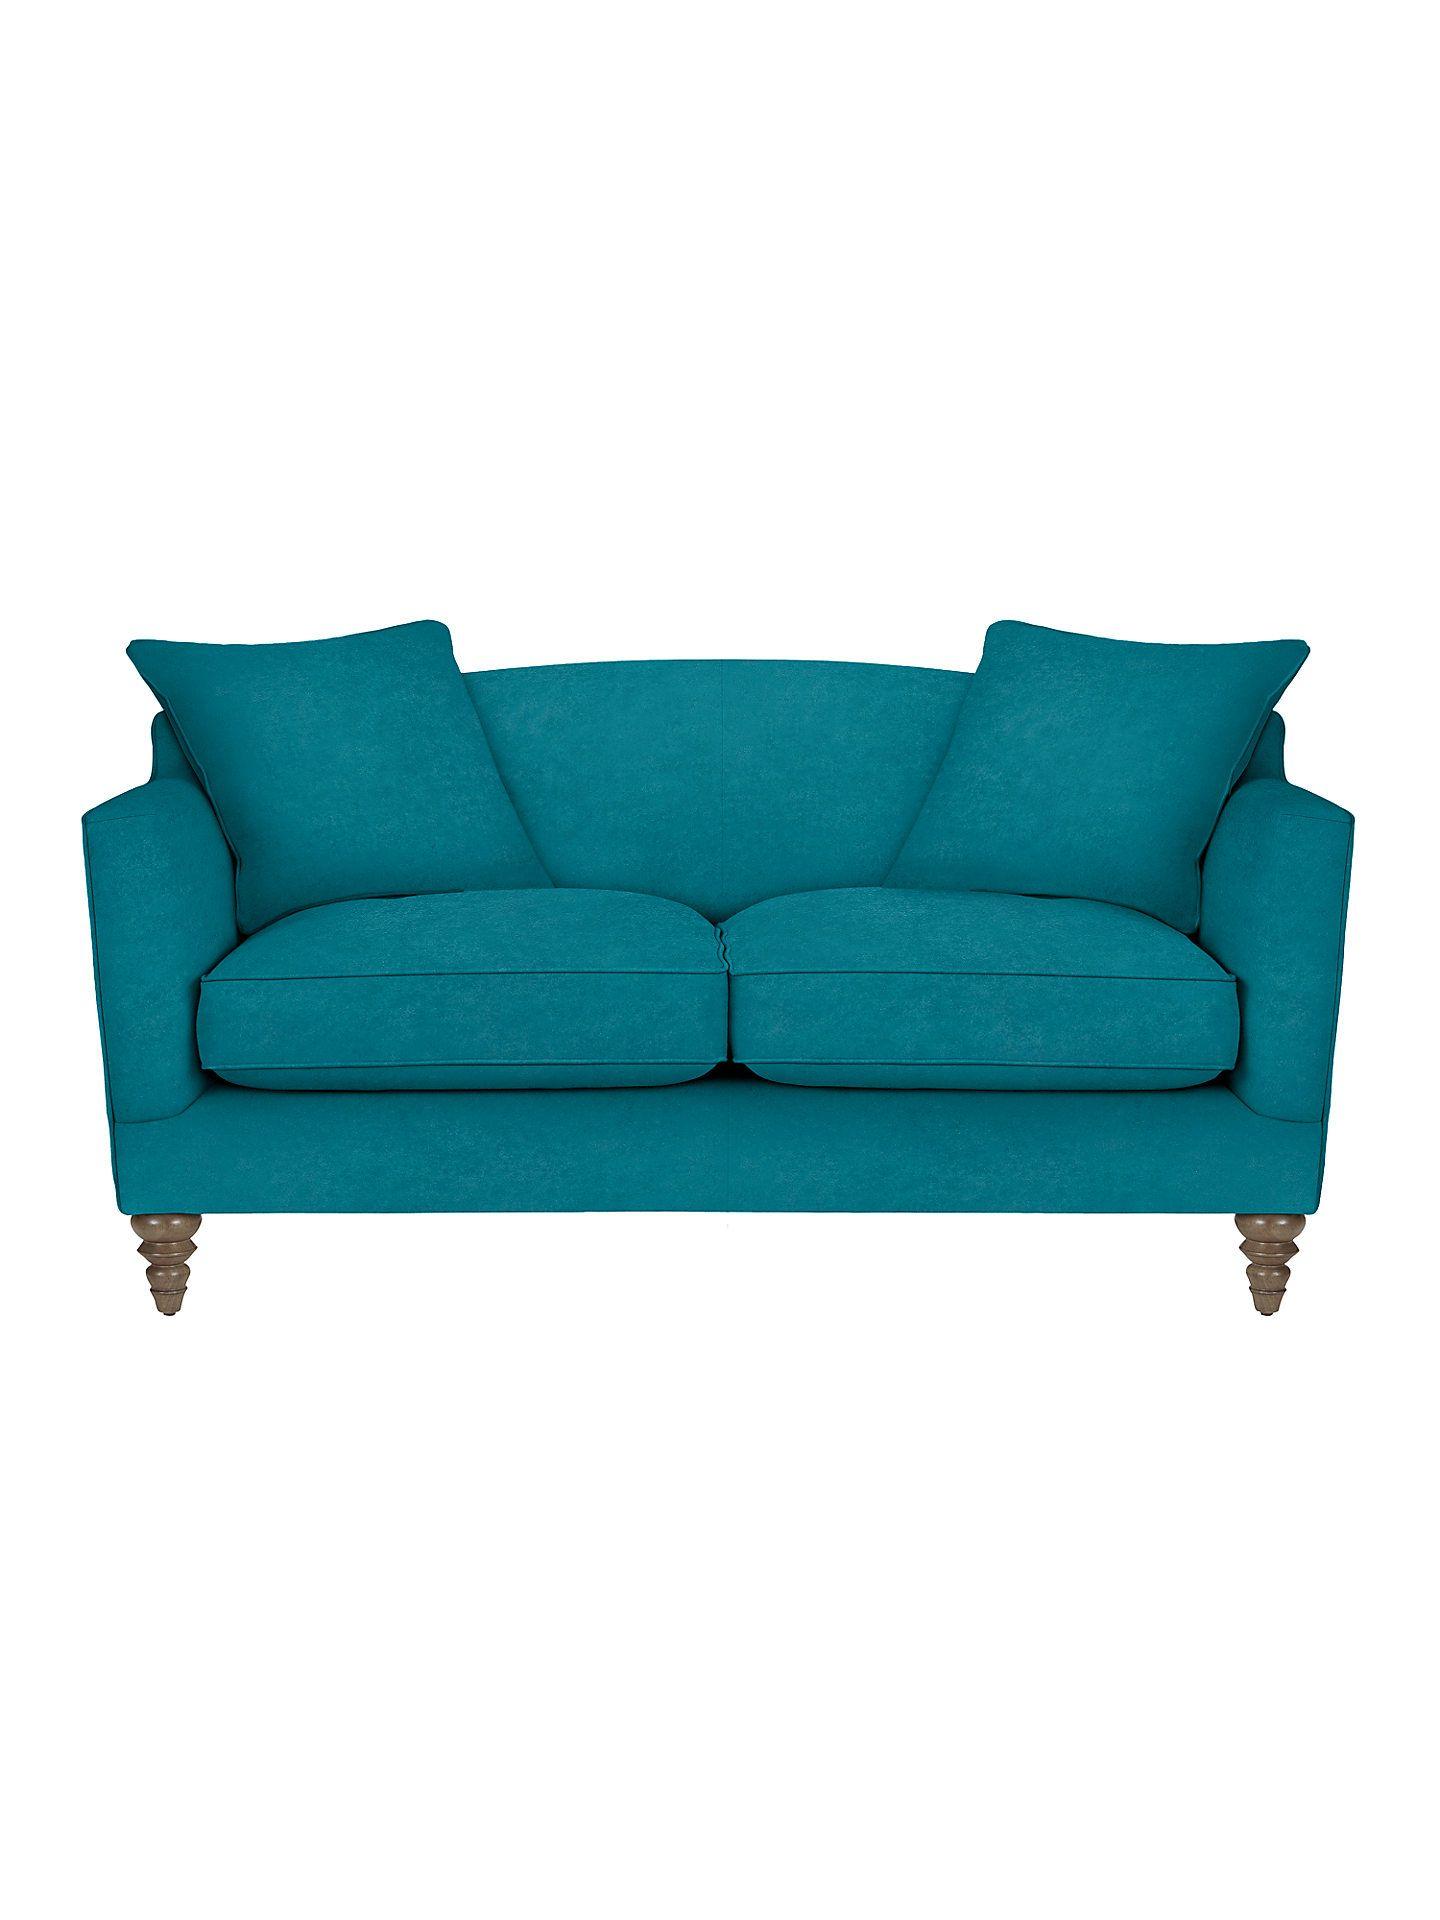 Croft Collection Melrose Fixed Cover Small 2 Seater Sofa Sofa 2 Seater Sofa Furniture